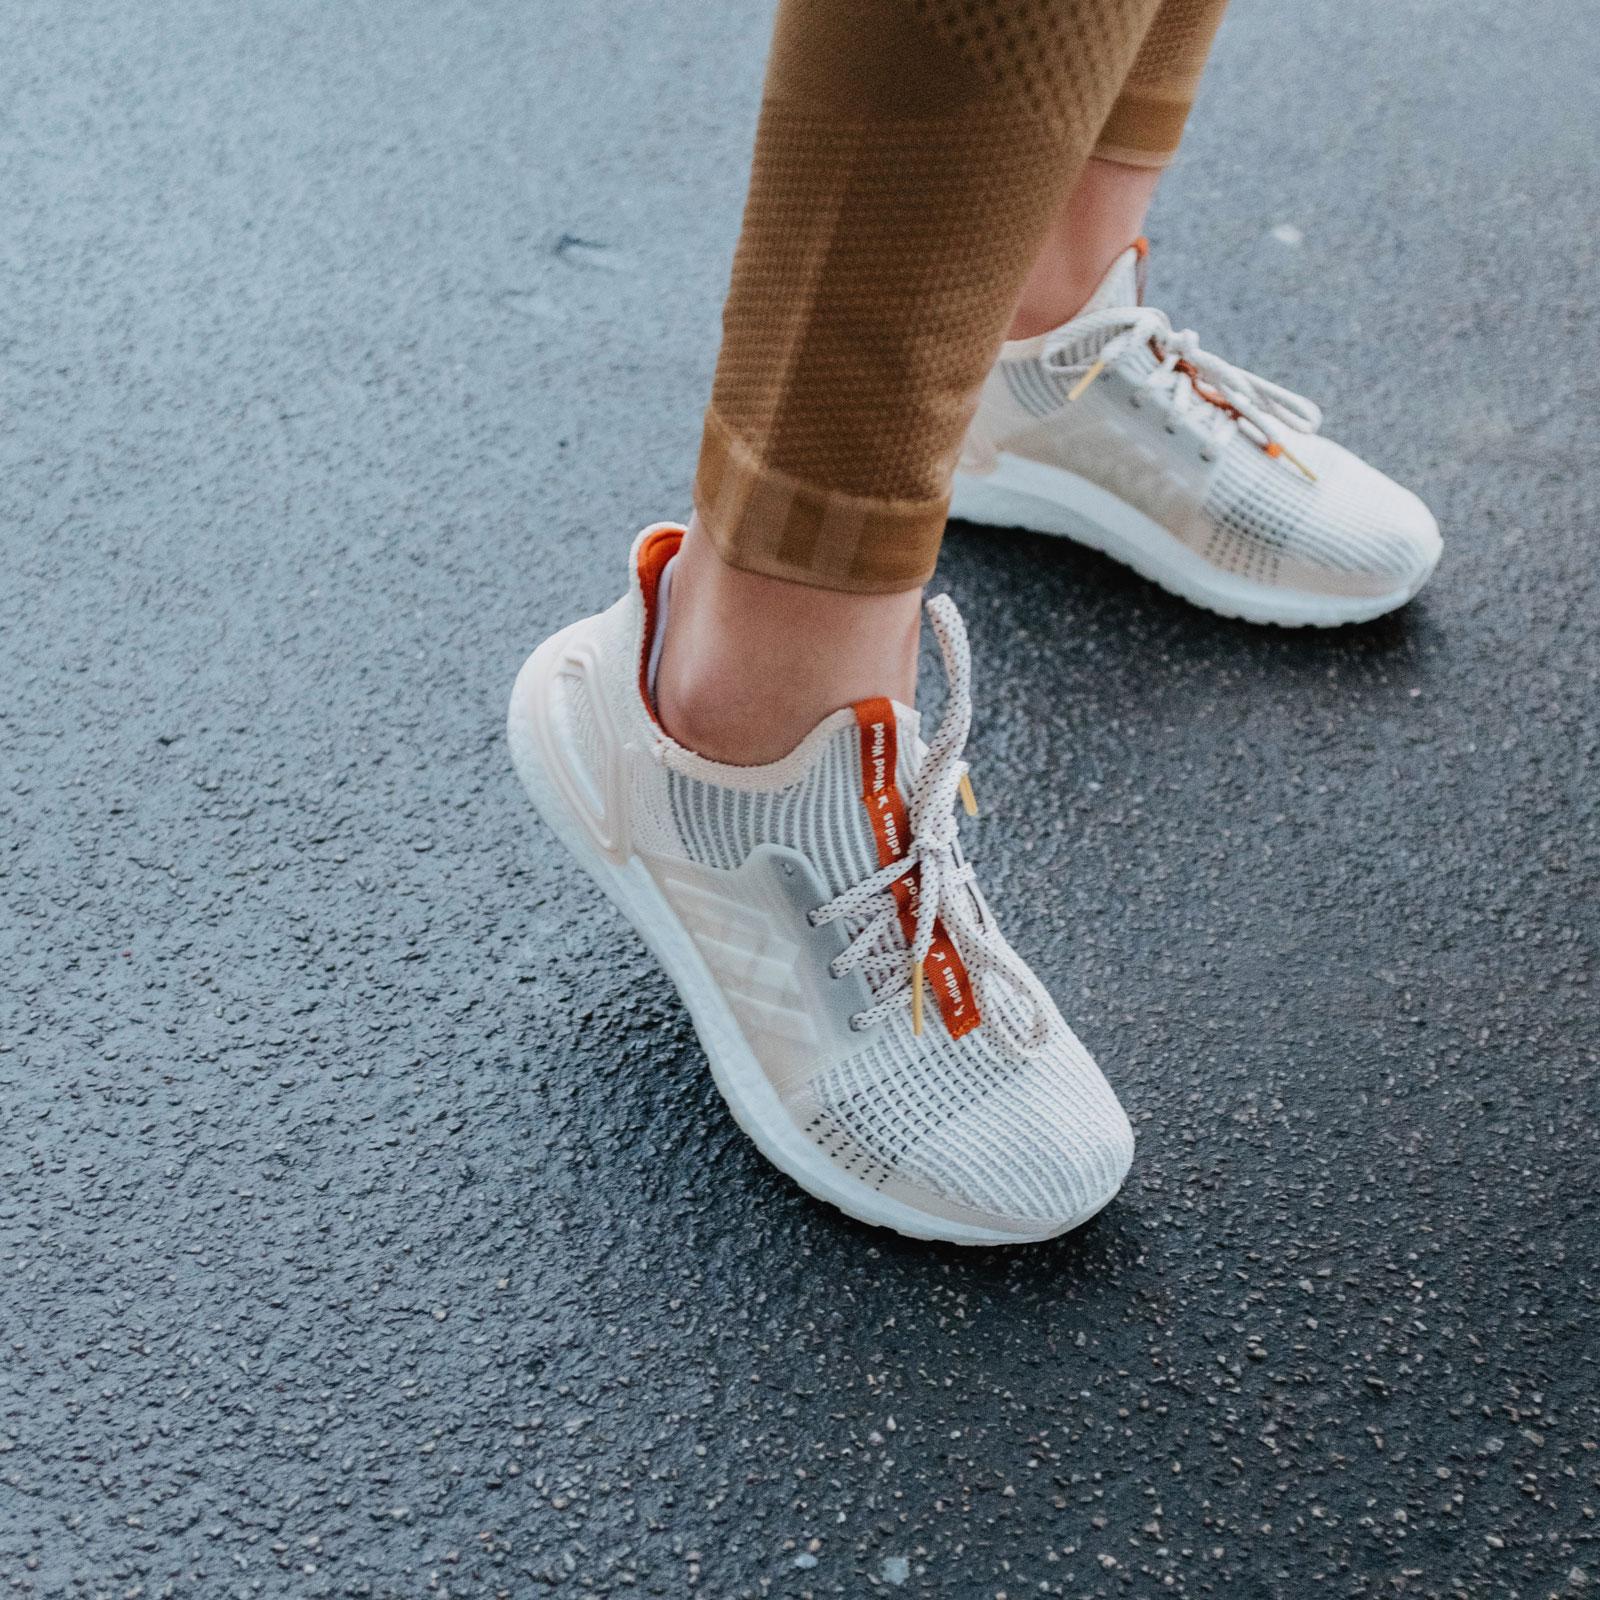 adidas Ultraboost 19 x Wood Wood - Eg1727 - Sneakersnstuff ...